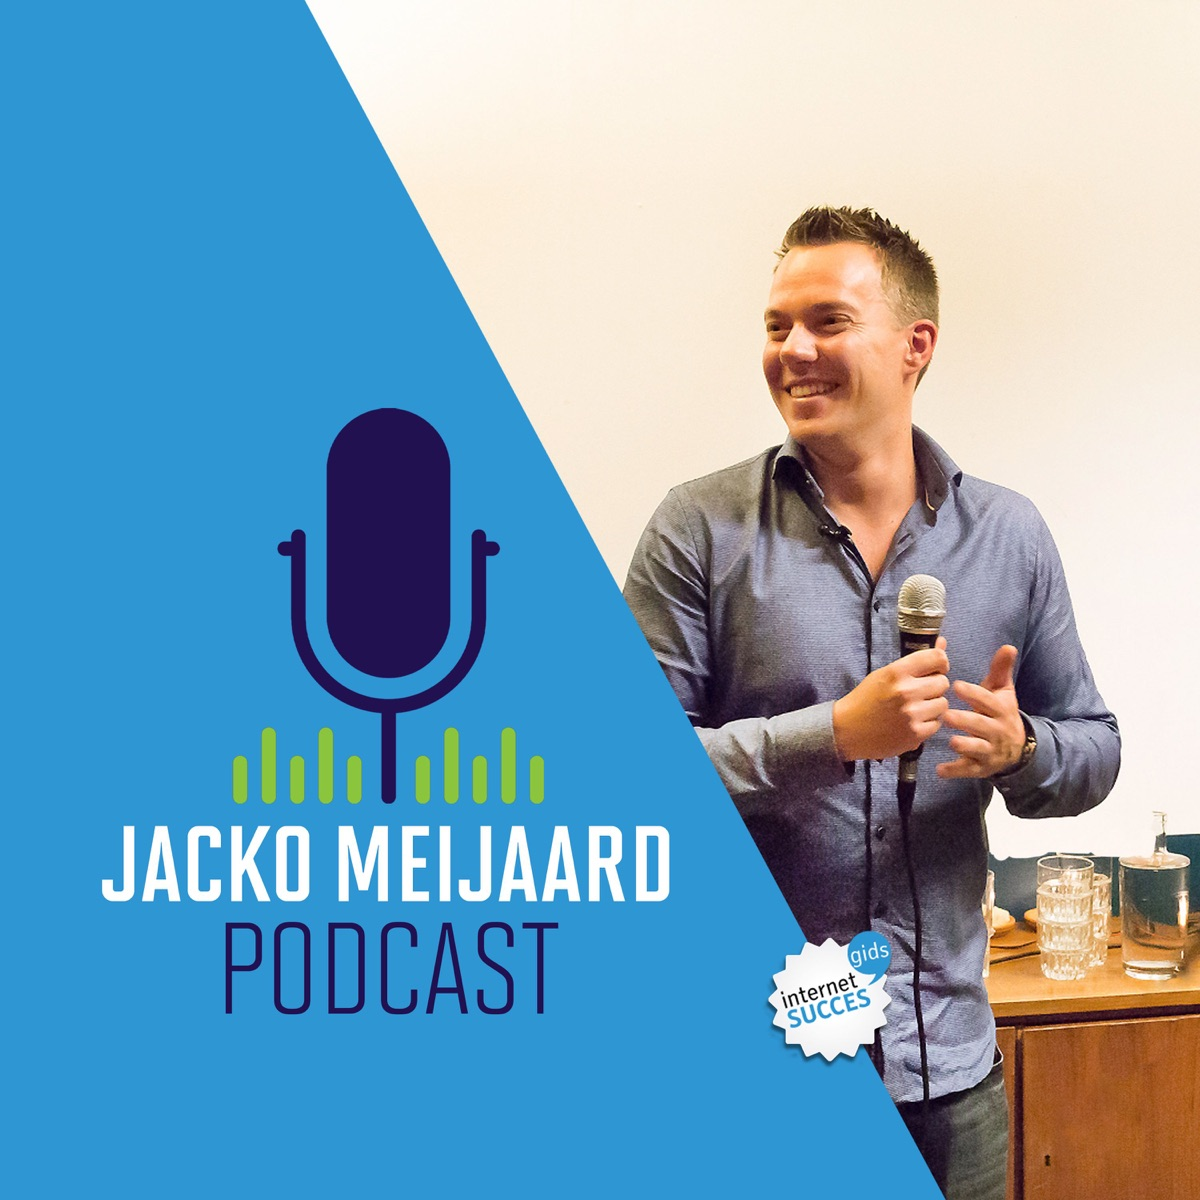 Jacko Meijaard Podcast